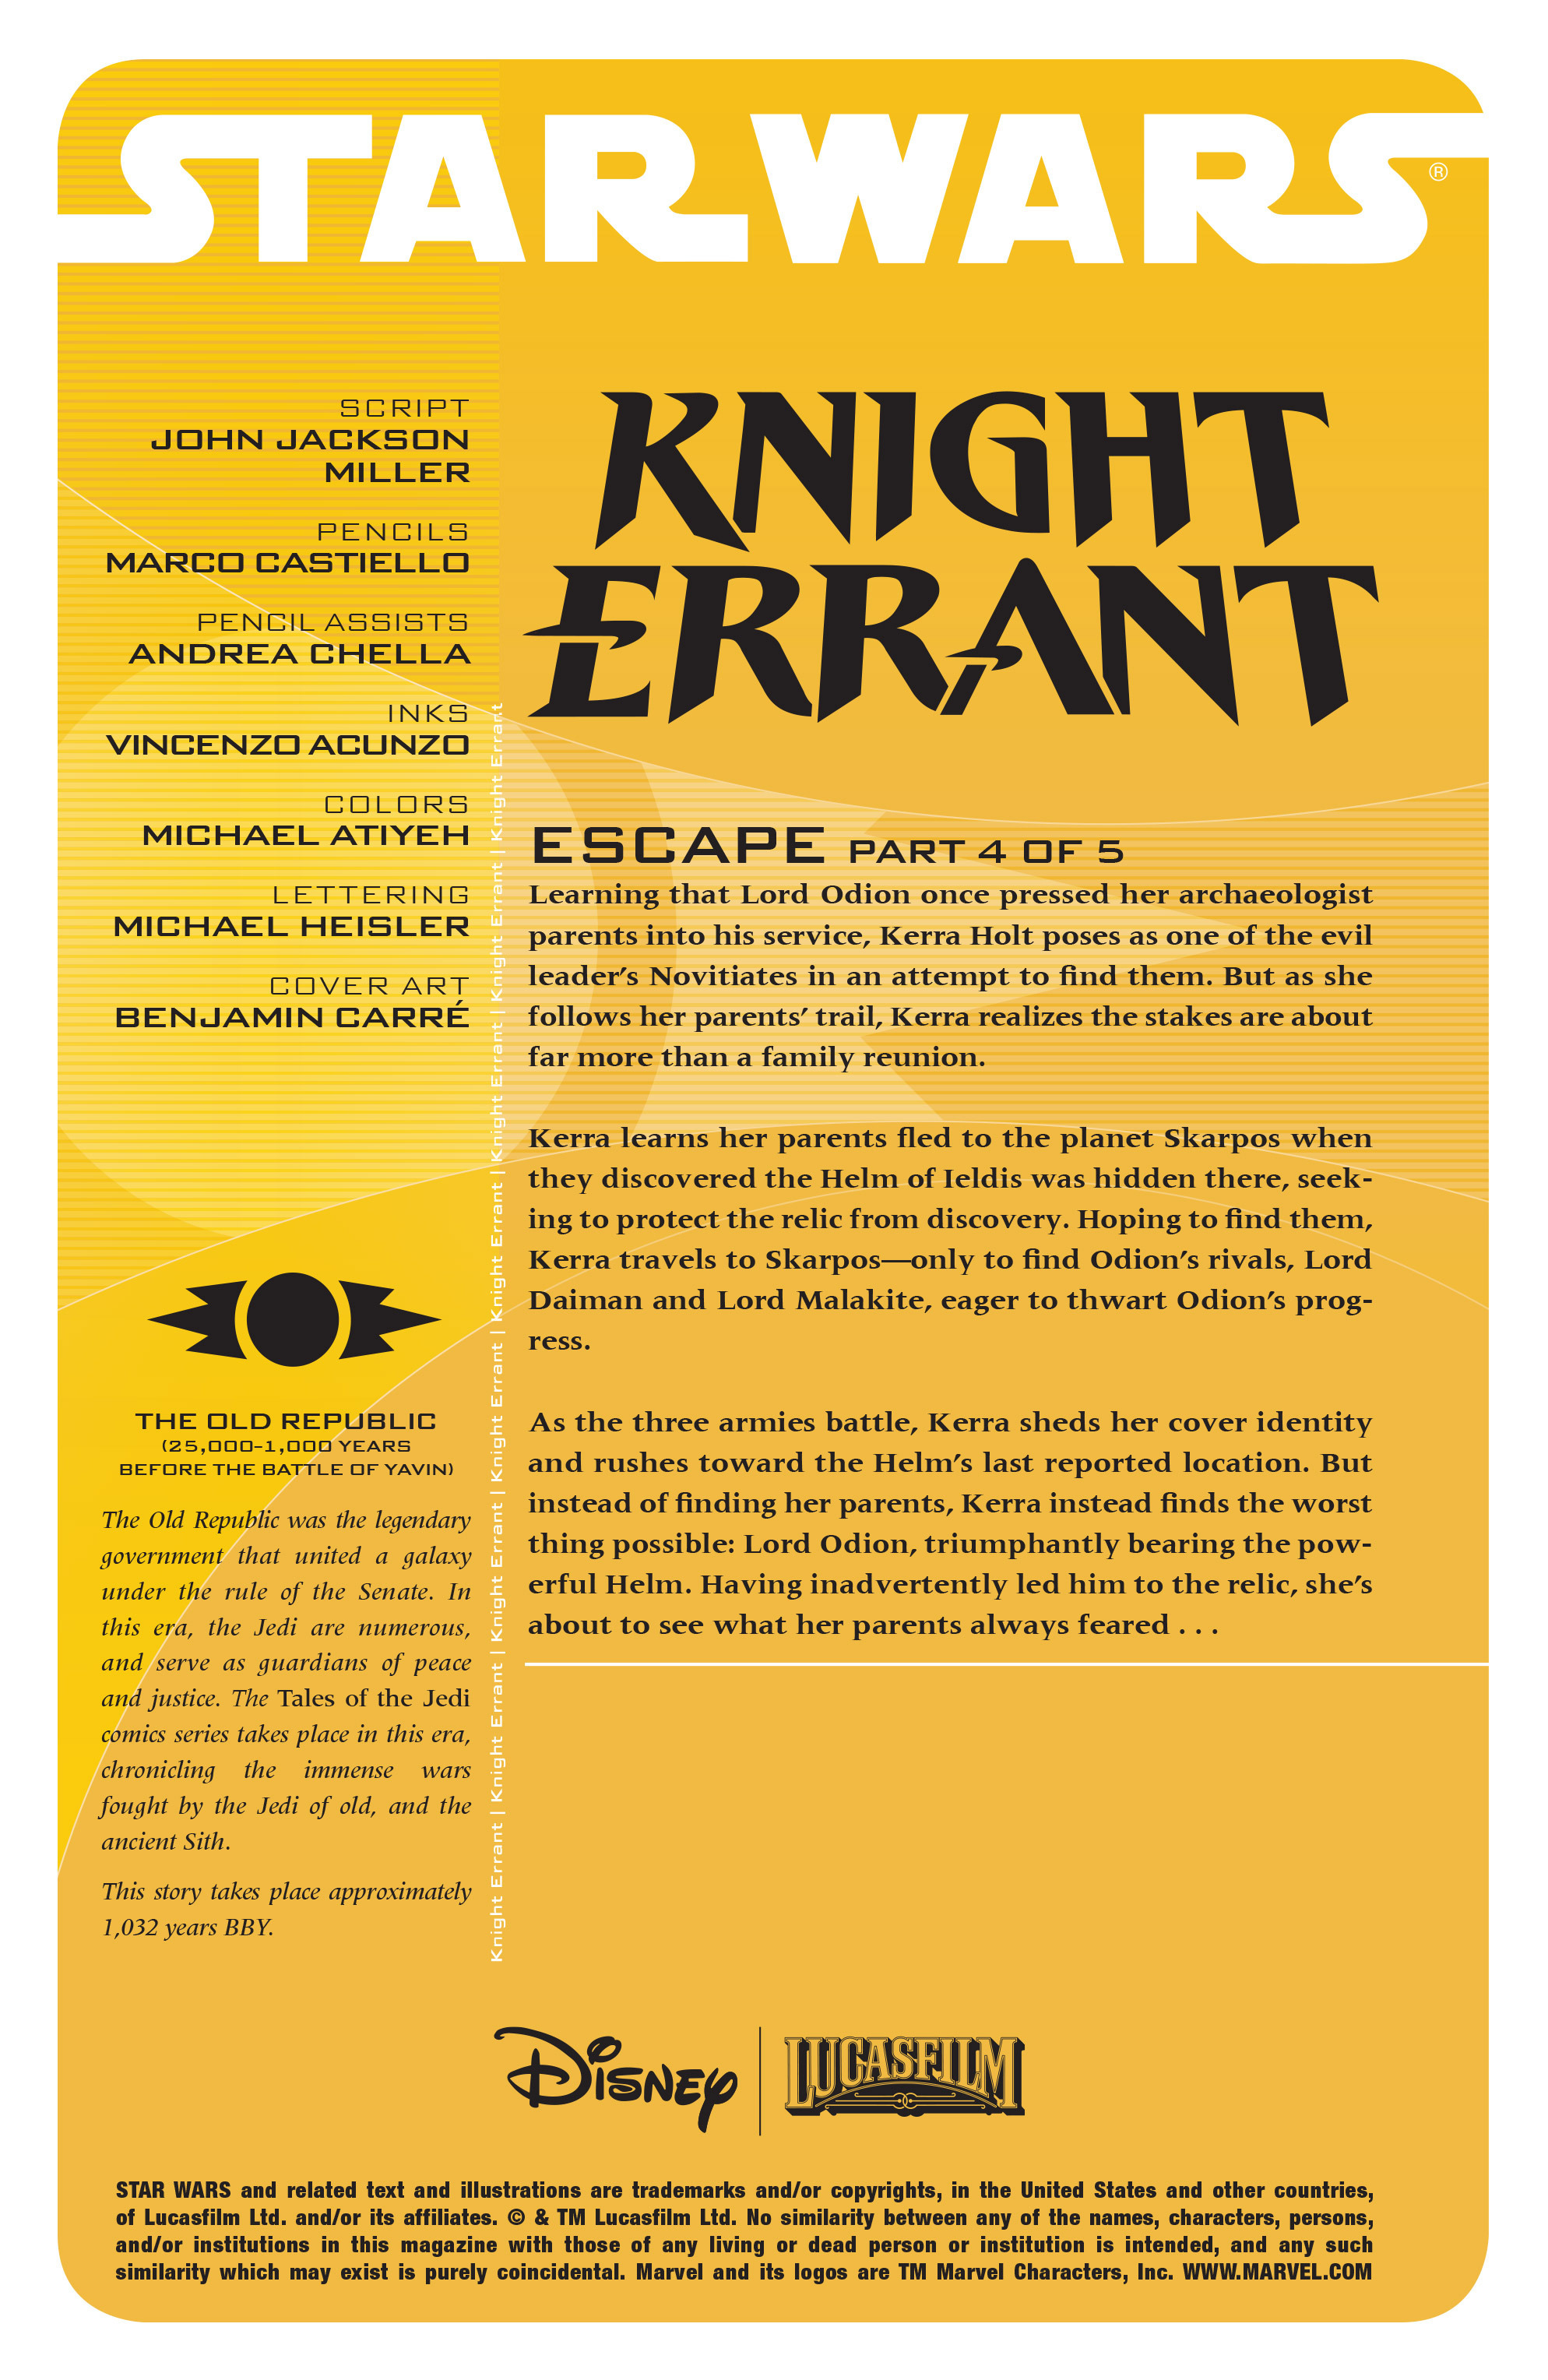 Read online Star Wars: Knight Errant - Escape comic -  Issue #4 - 2